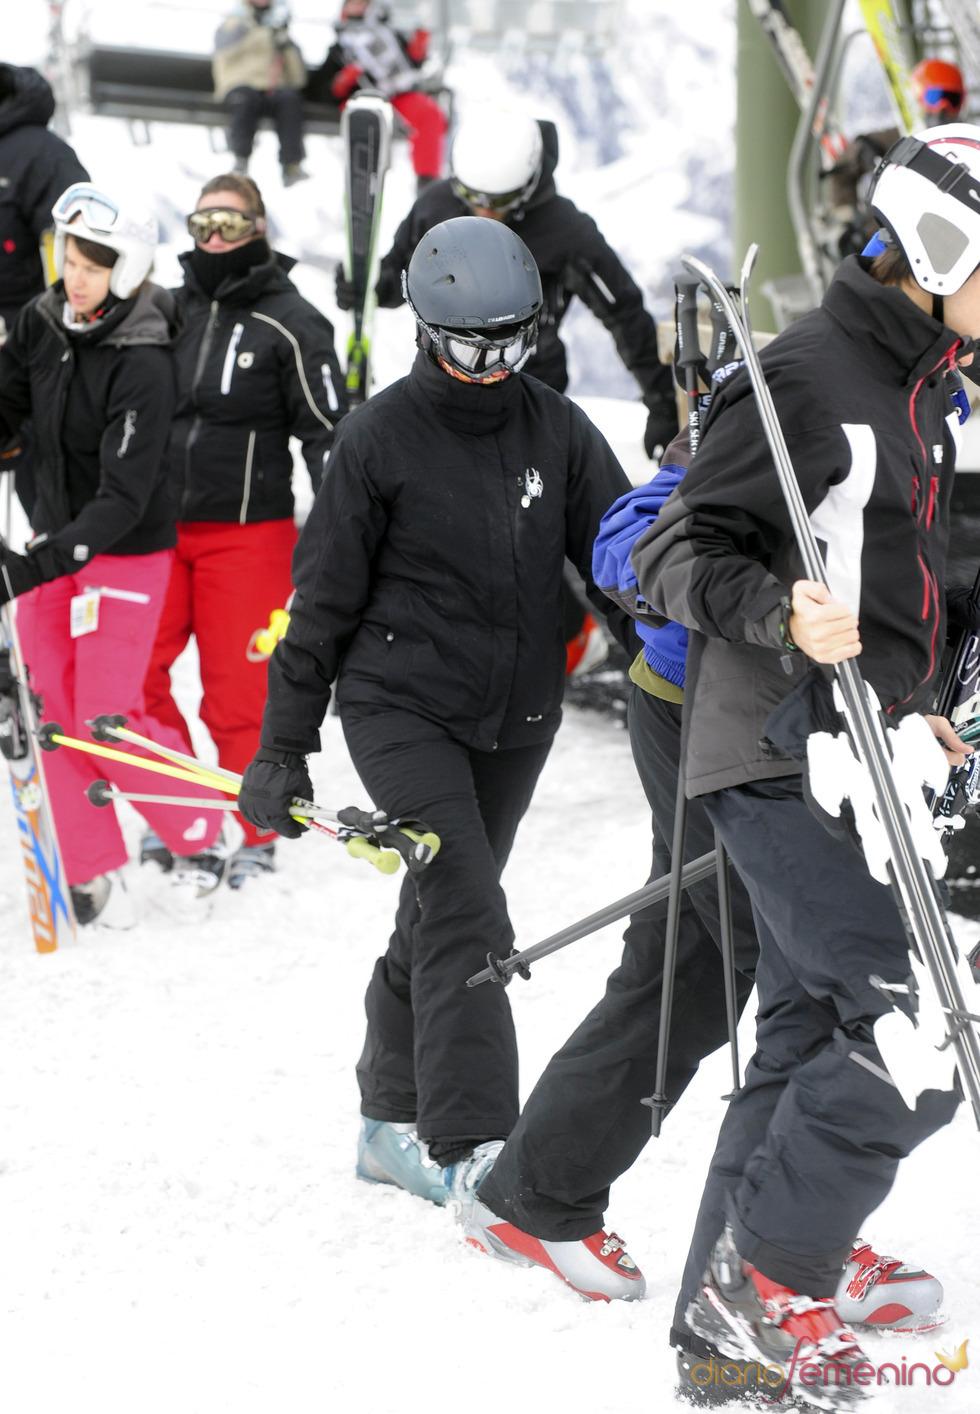 La Infanta Elena inicia la temporada de esquí en Baqueira